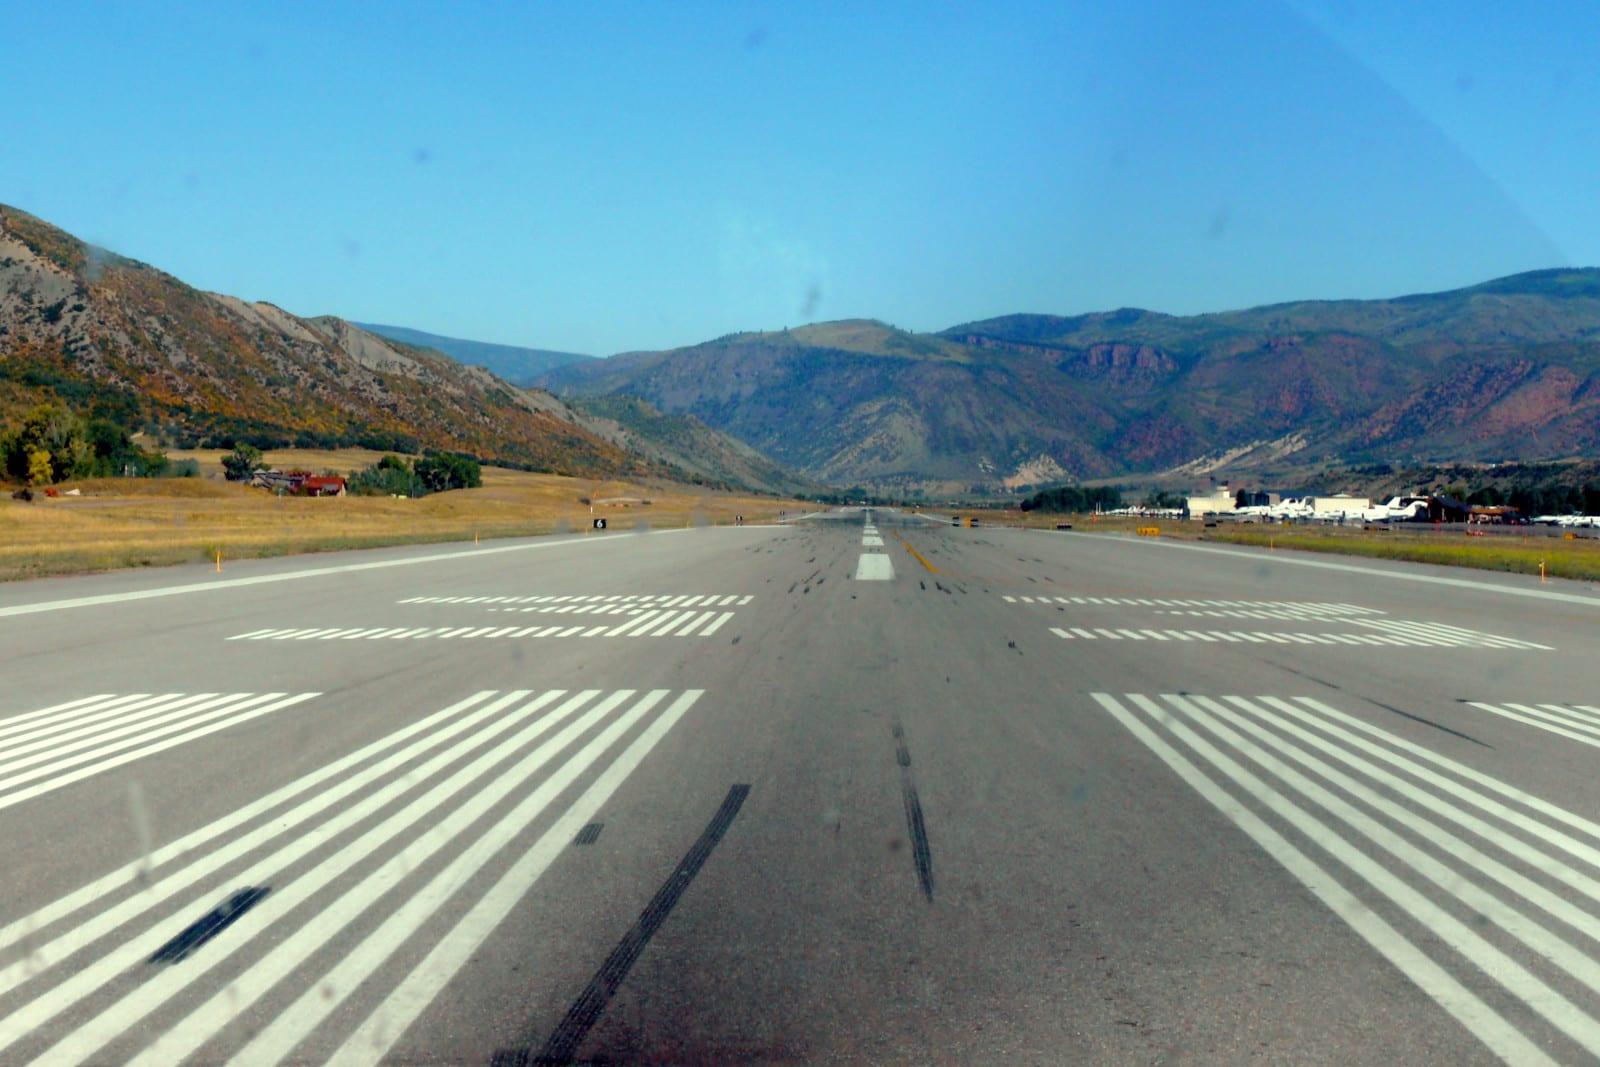 Aspen-Pitkin County Airport Runway 33